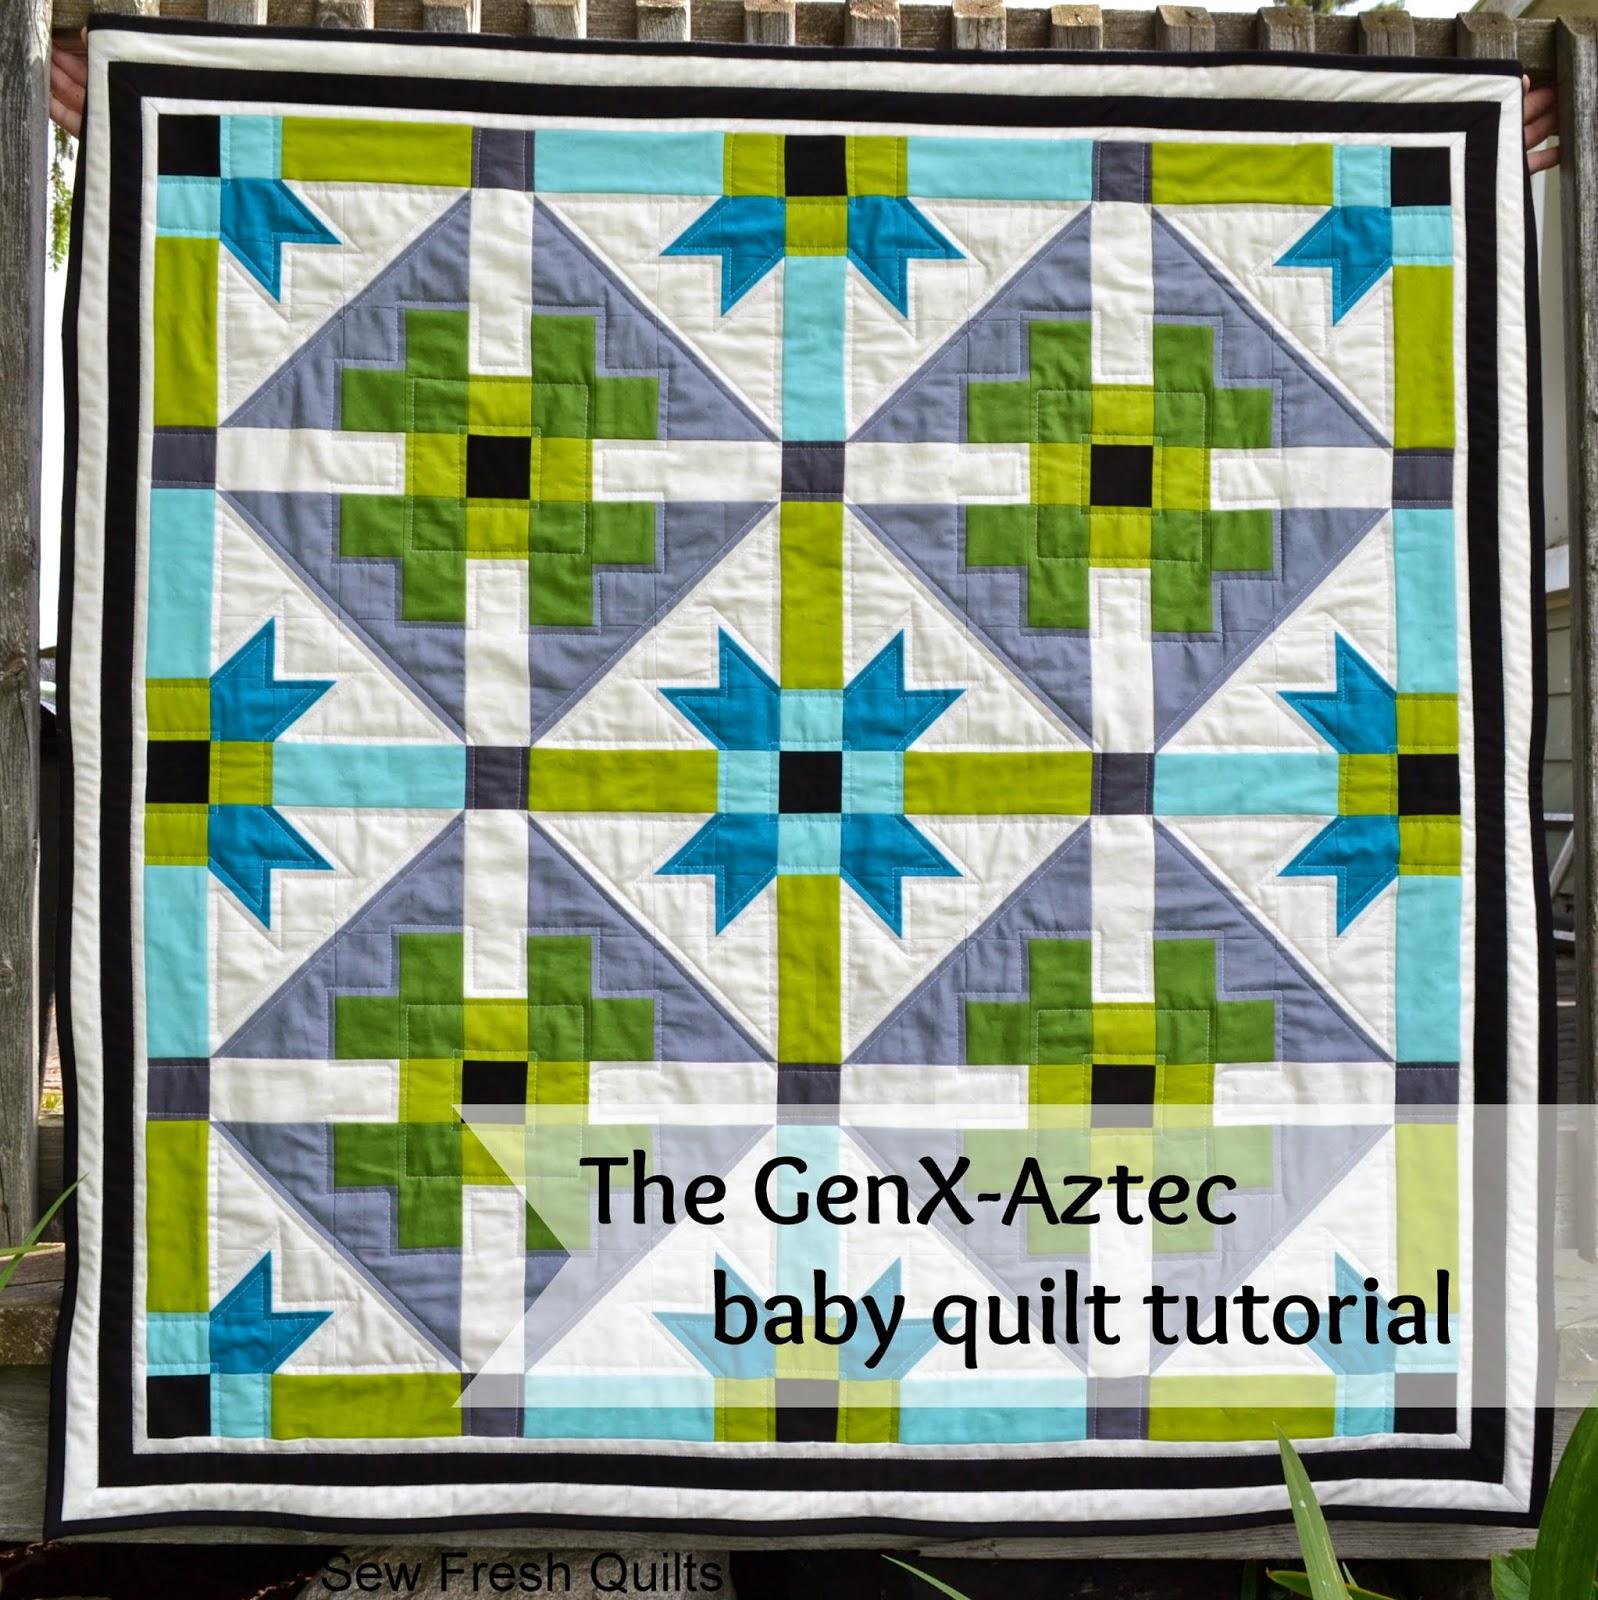 GenX-Axtec baby quilt tutorial